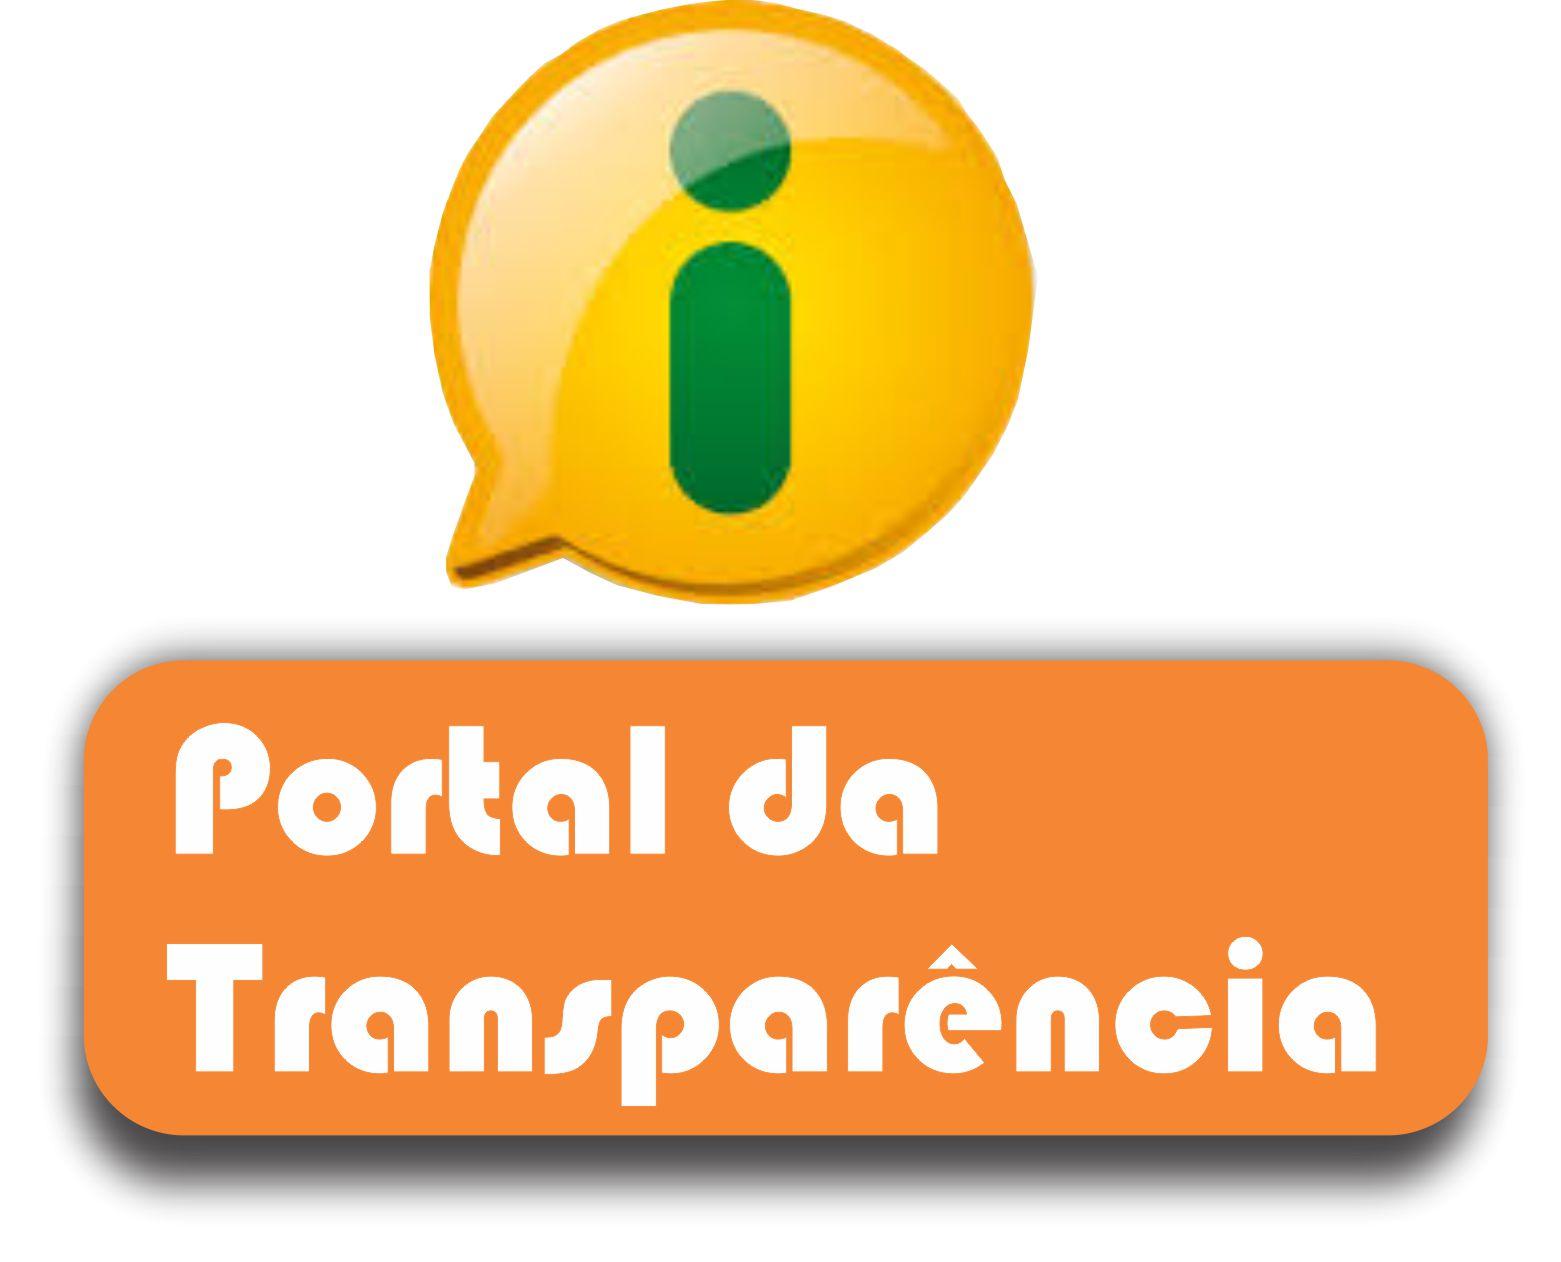 WhatsApp-Image-2021-02-25-at-16.30.24-800x550 CMBR